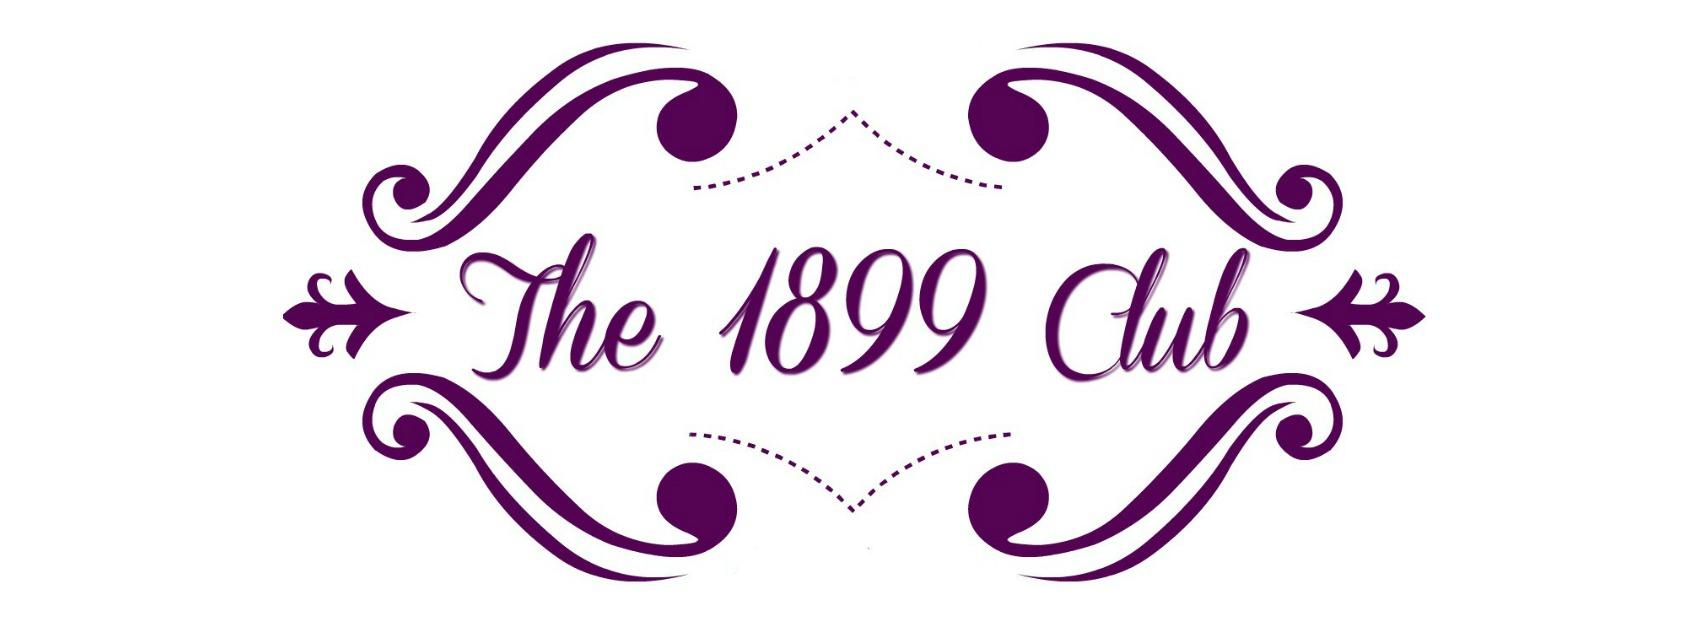 1899 Club